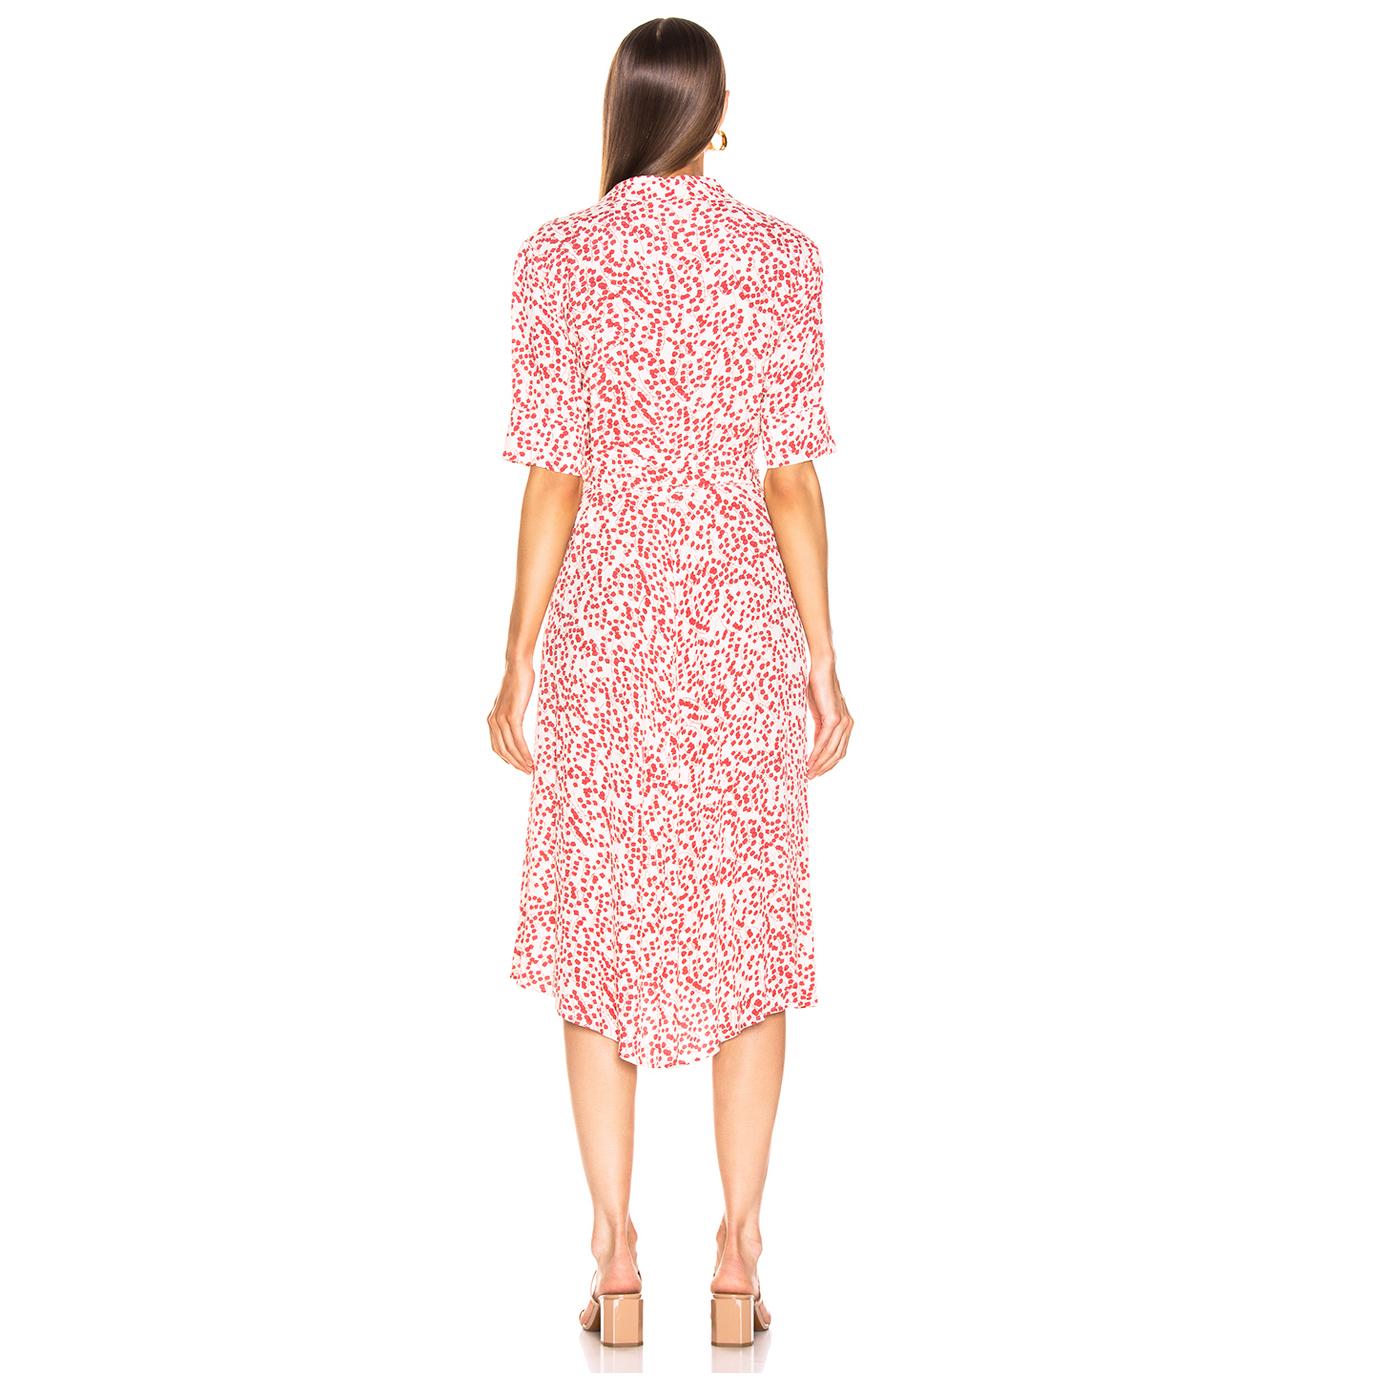 GANNI Floral Printed Wrap Crepe Dress with Tie Closure